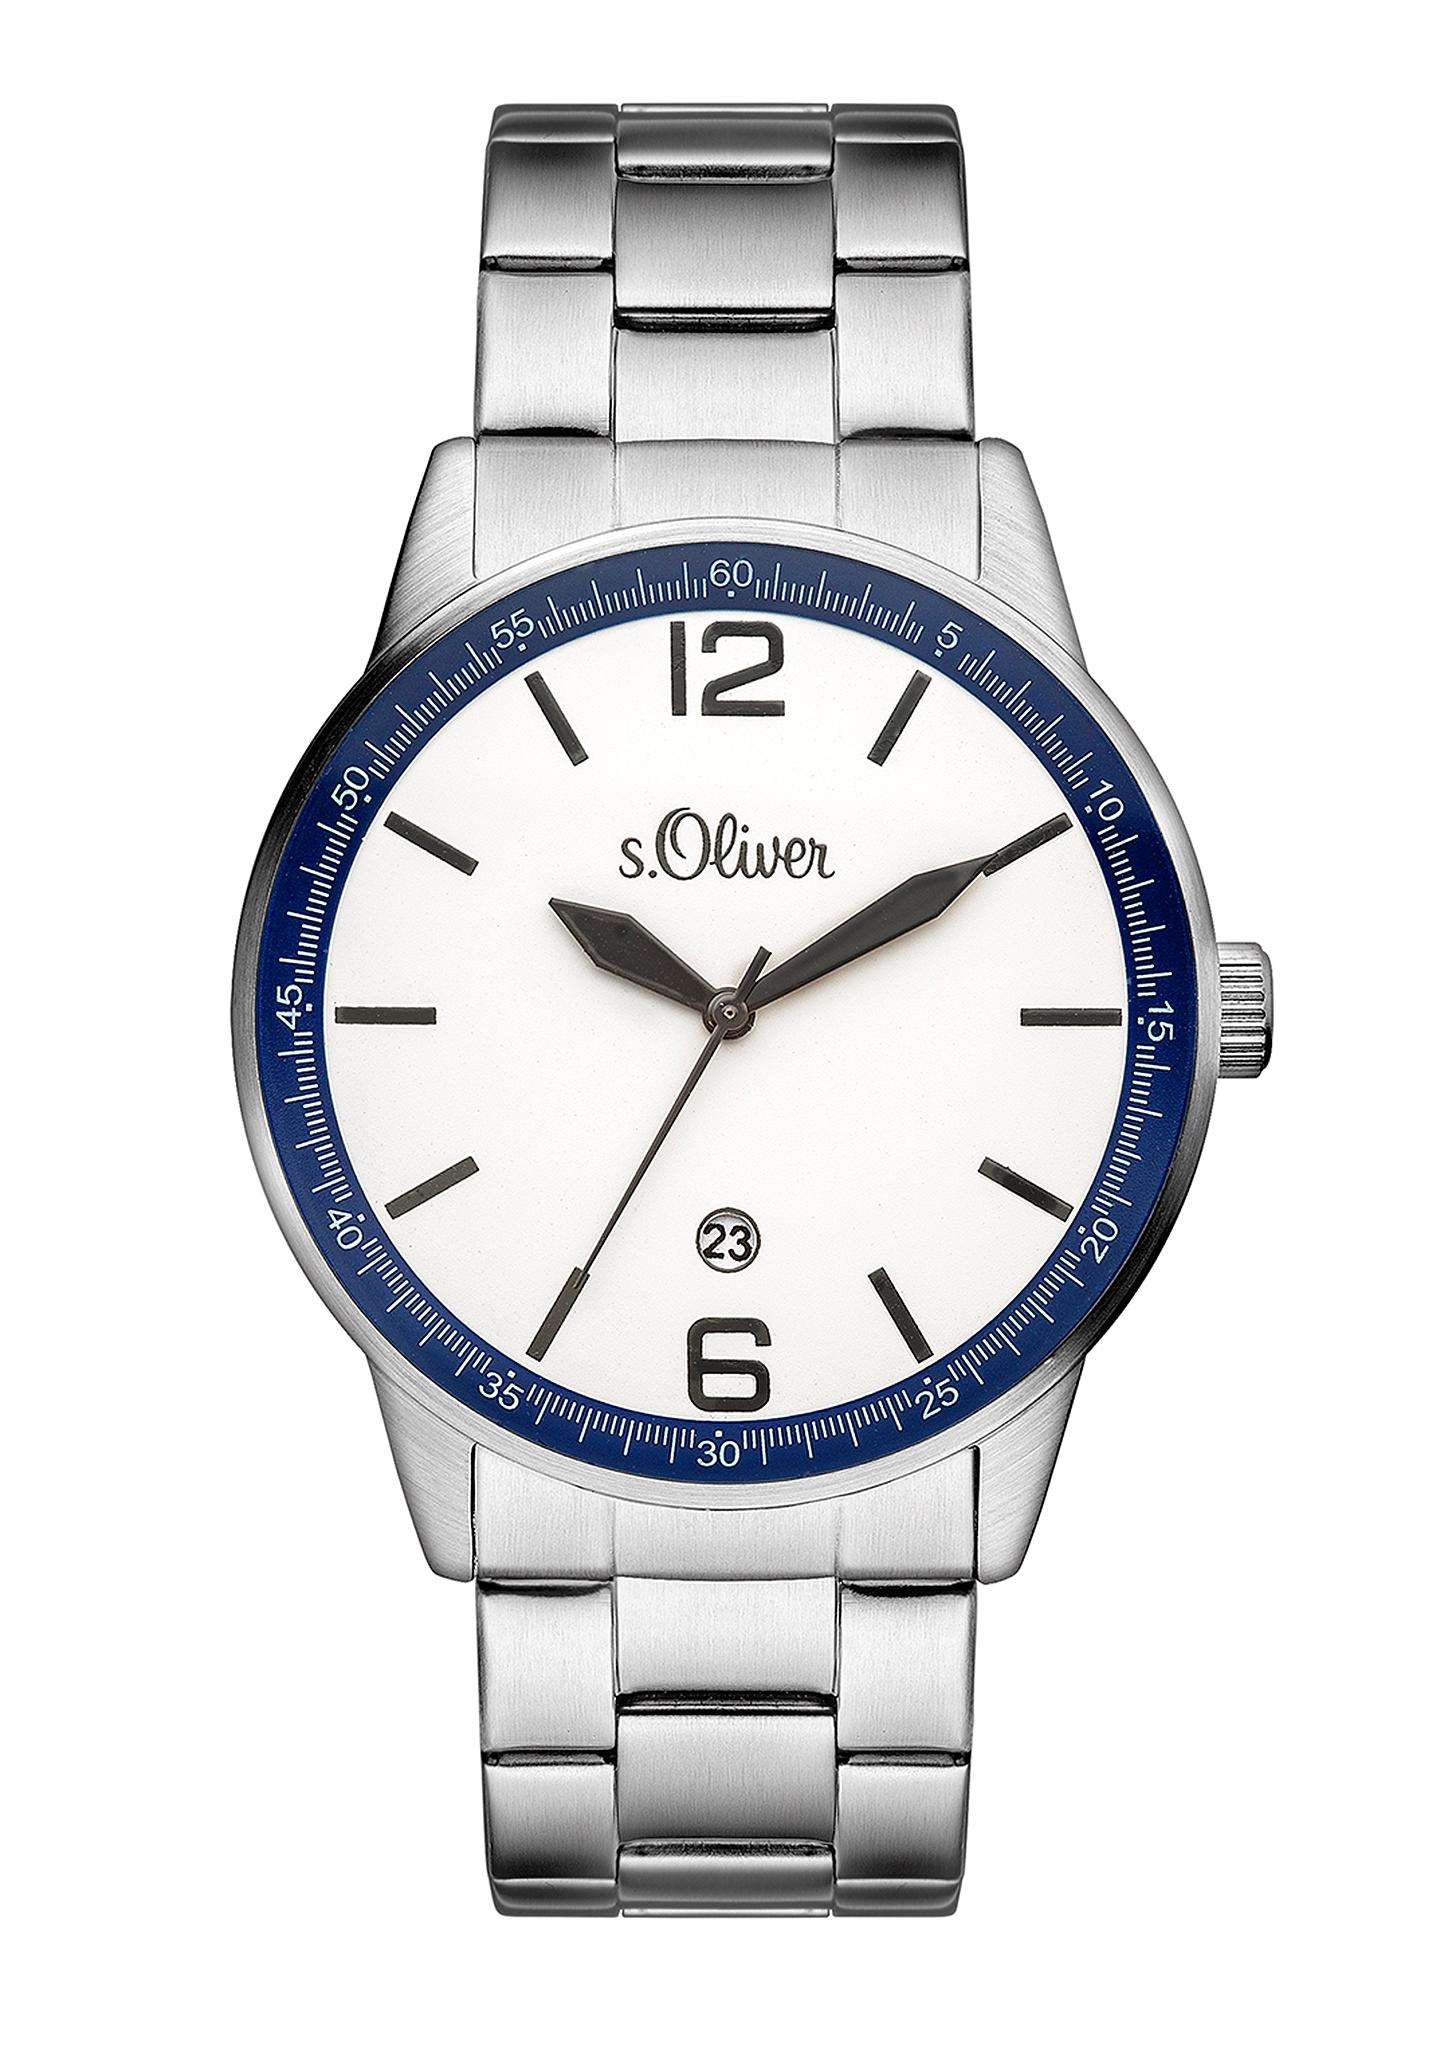 Armbanduhr   Uhren > Sonstige Armbanduhren   Weiß   Edelstahl -  glas   s.Oliver